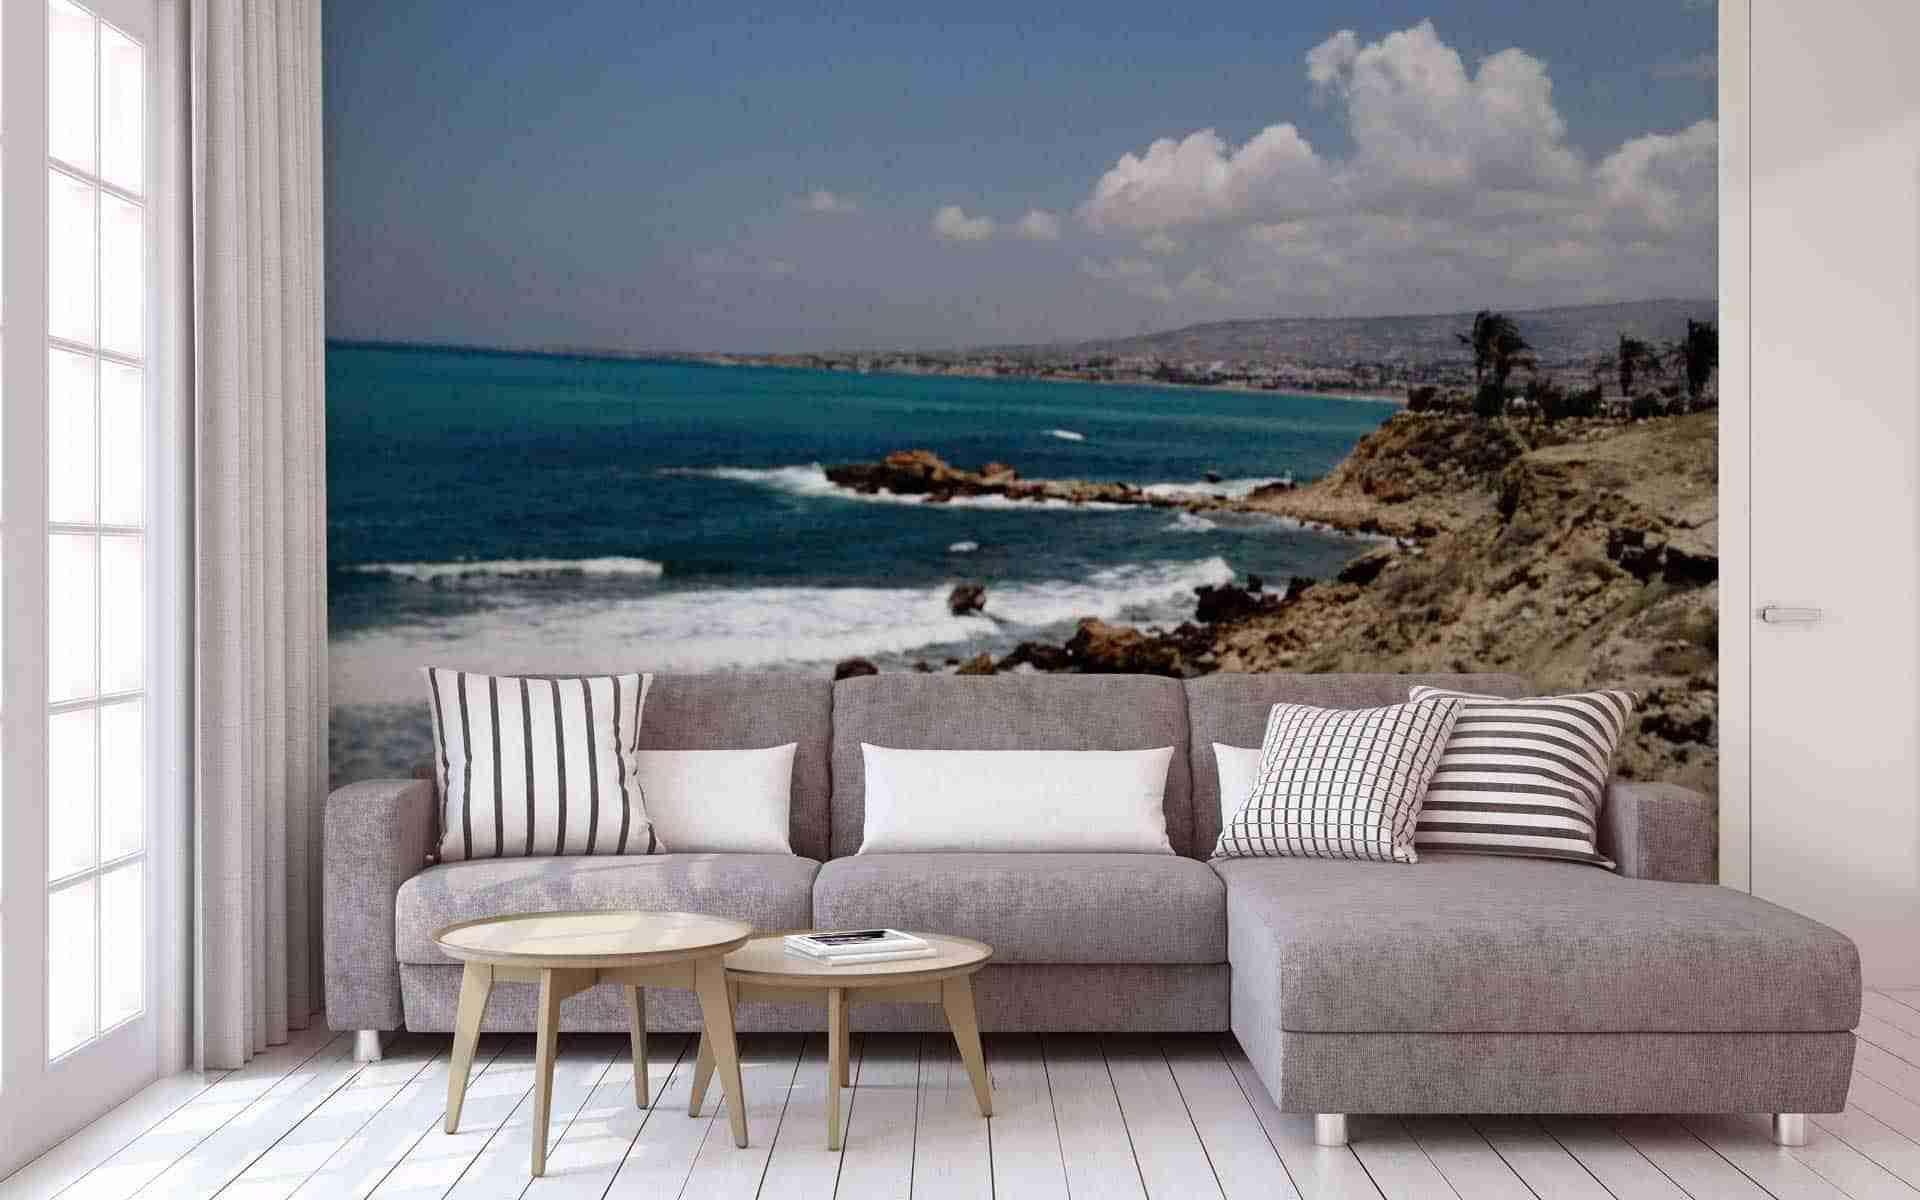 cyprus-wall-art-print-getitprinted.com-sea